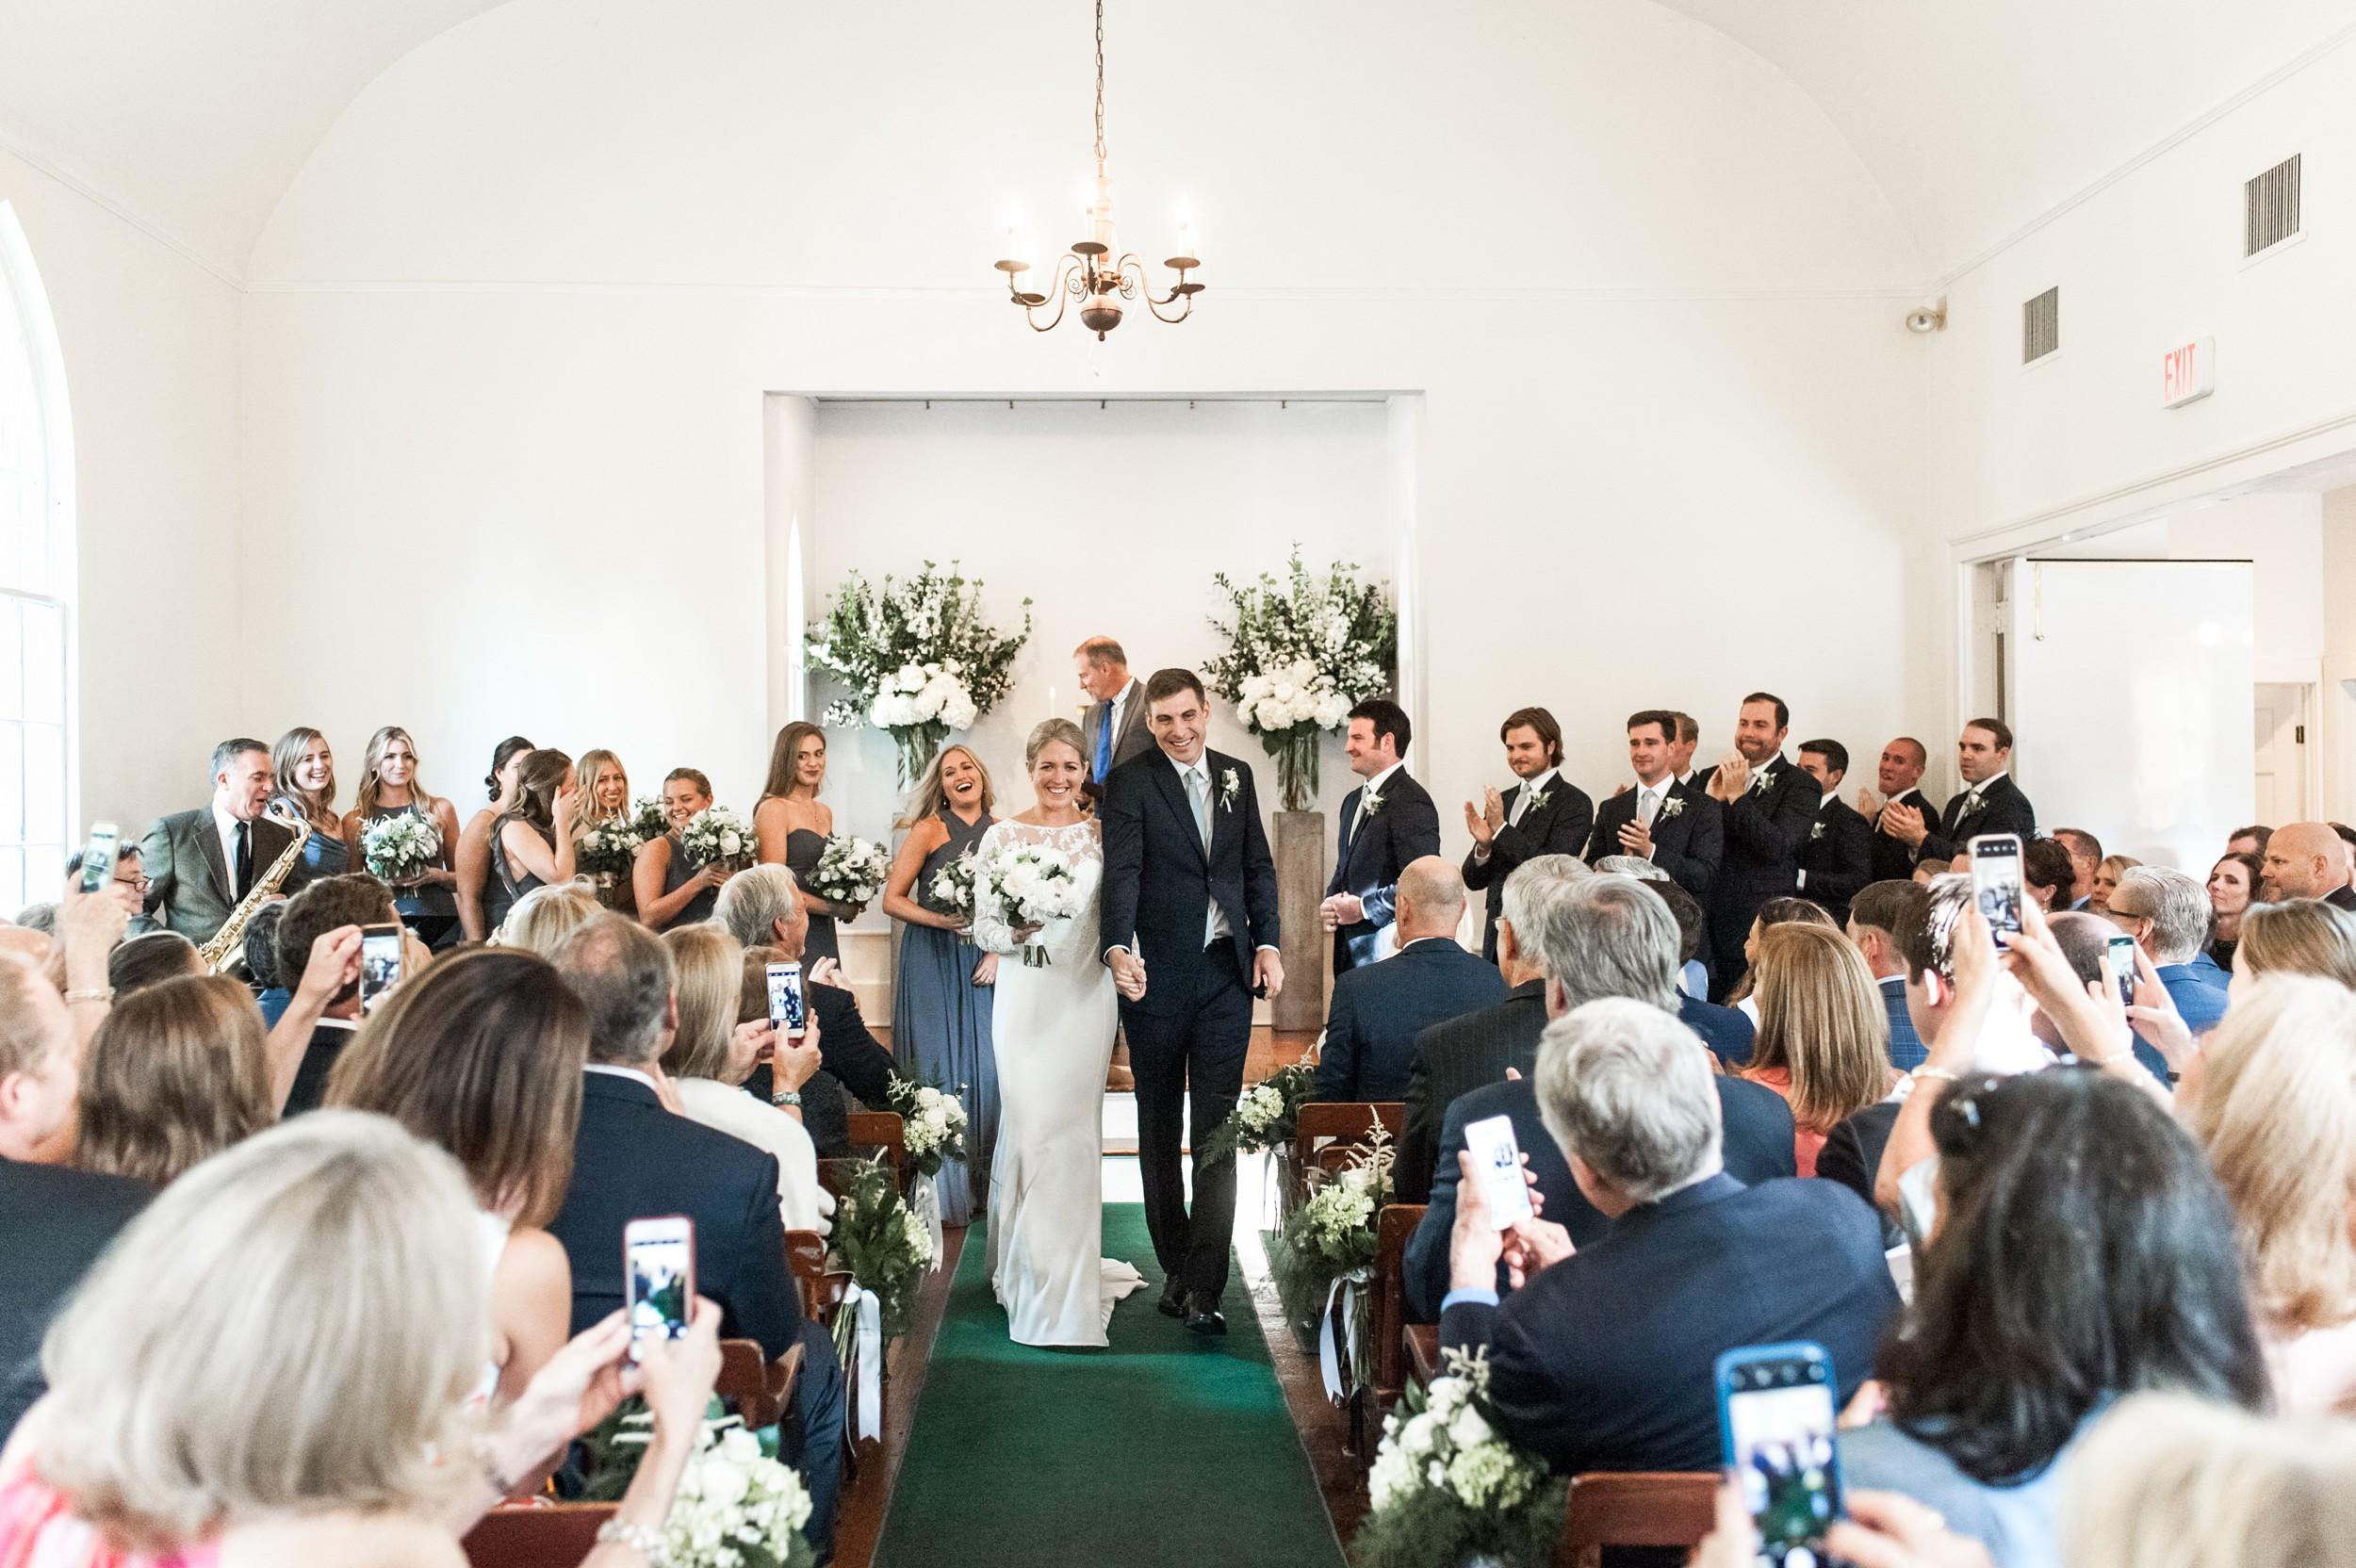 Wee Burn Beach Club Wedding Darien CT Talmidge Hill Community Church Wedding Ceremony bride and groom walk down the aisle as husband and wife